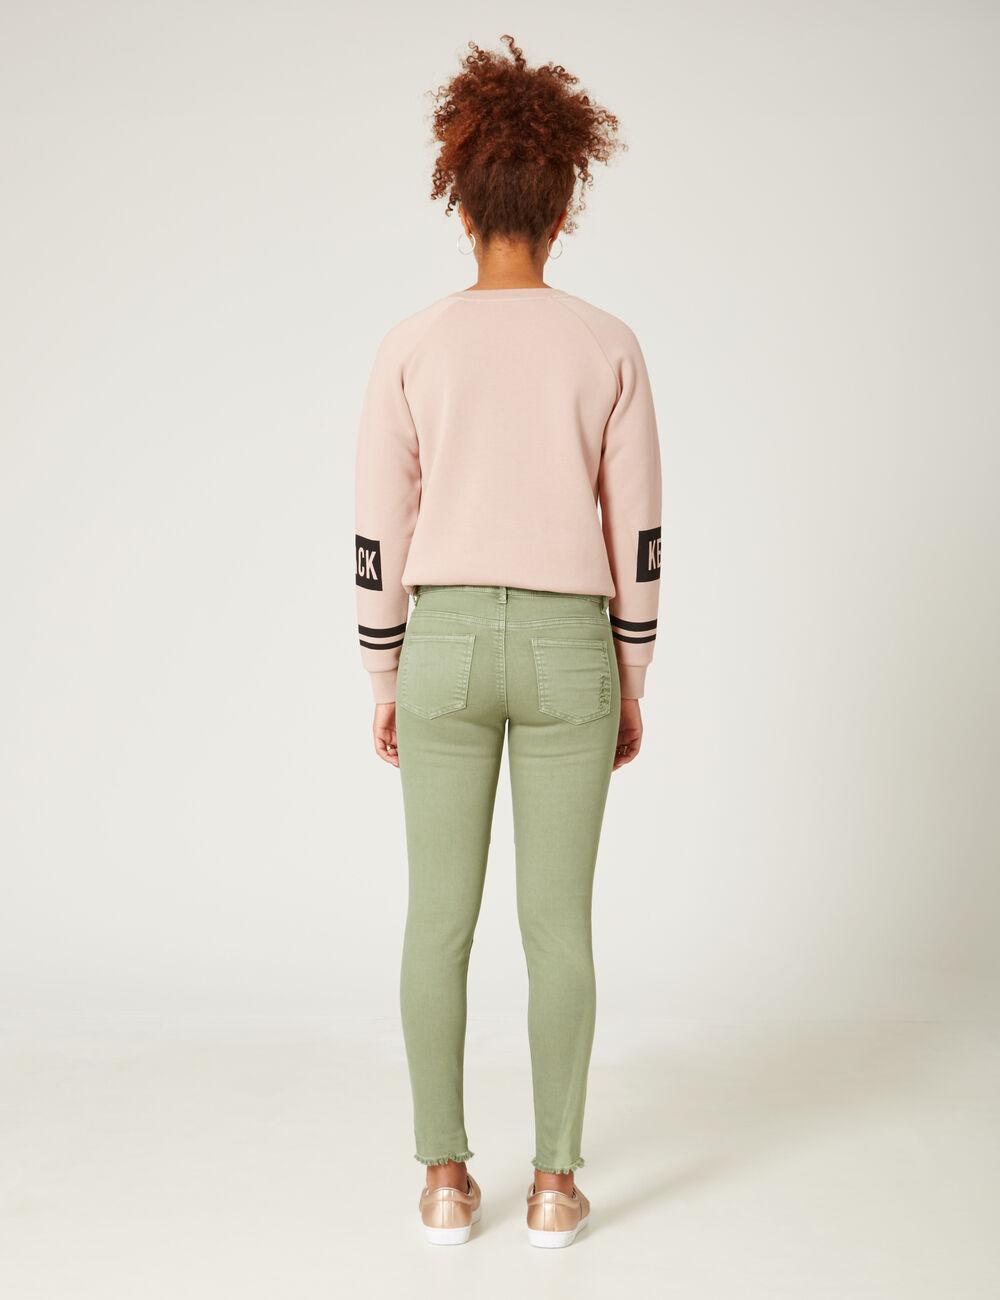 pantalon skinny d coupes kaki clair femme jennyfer. Black Bedroom Furniture Sets. Home Design Ideas